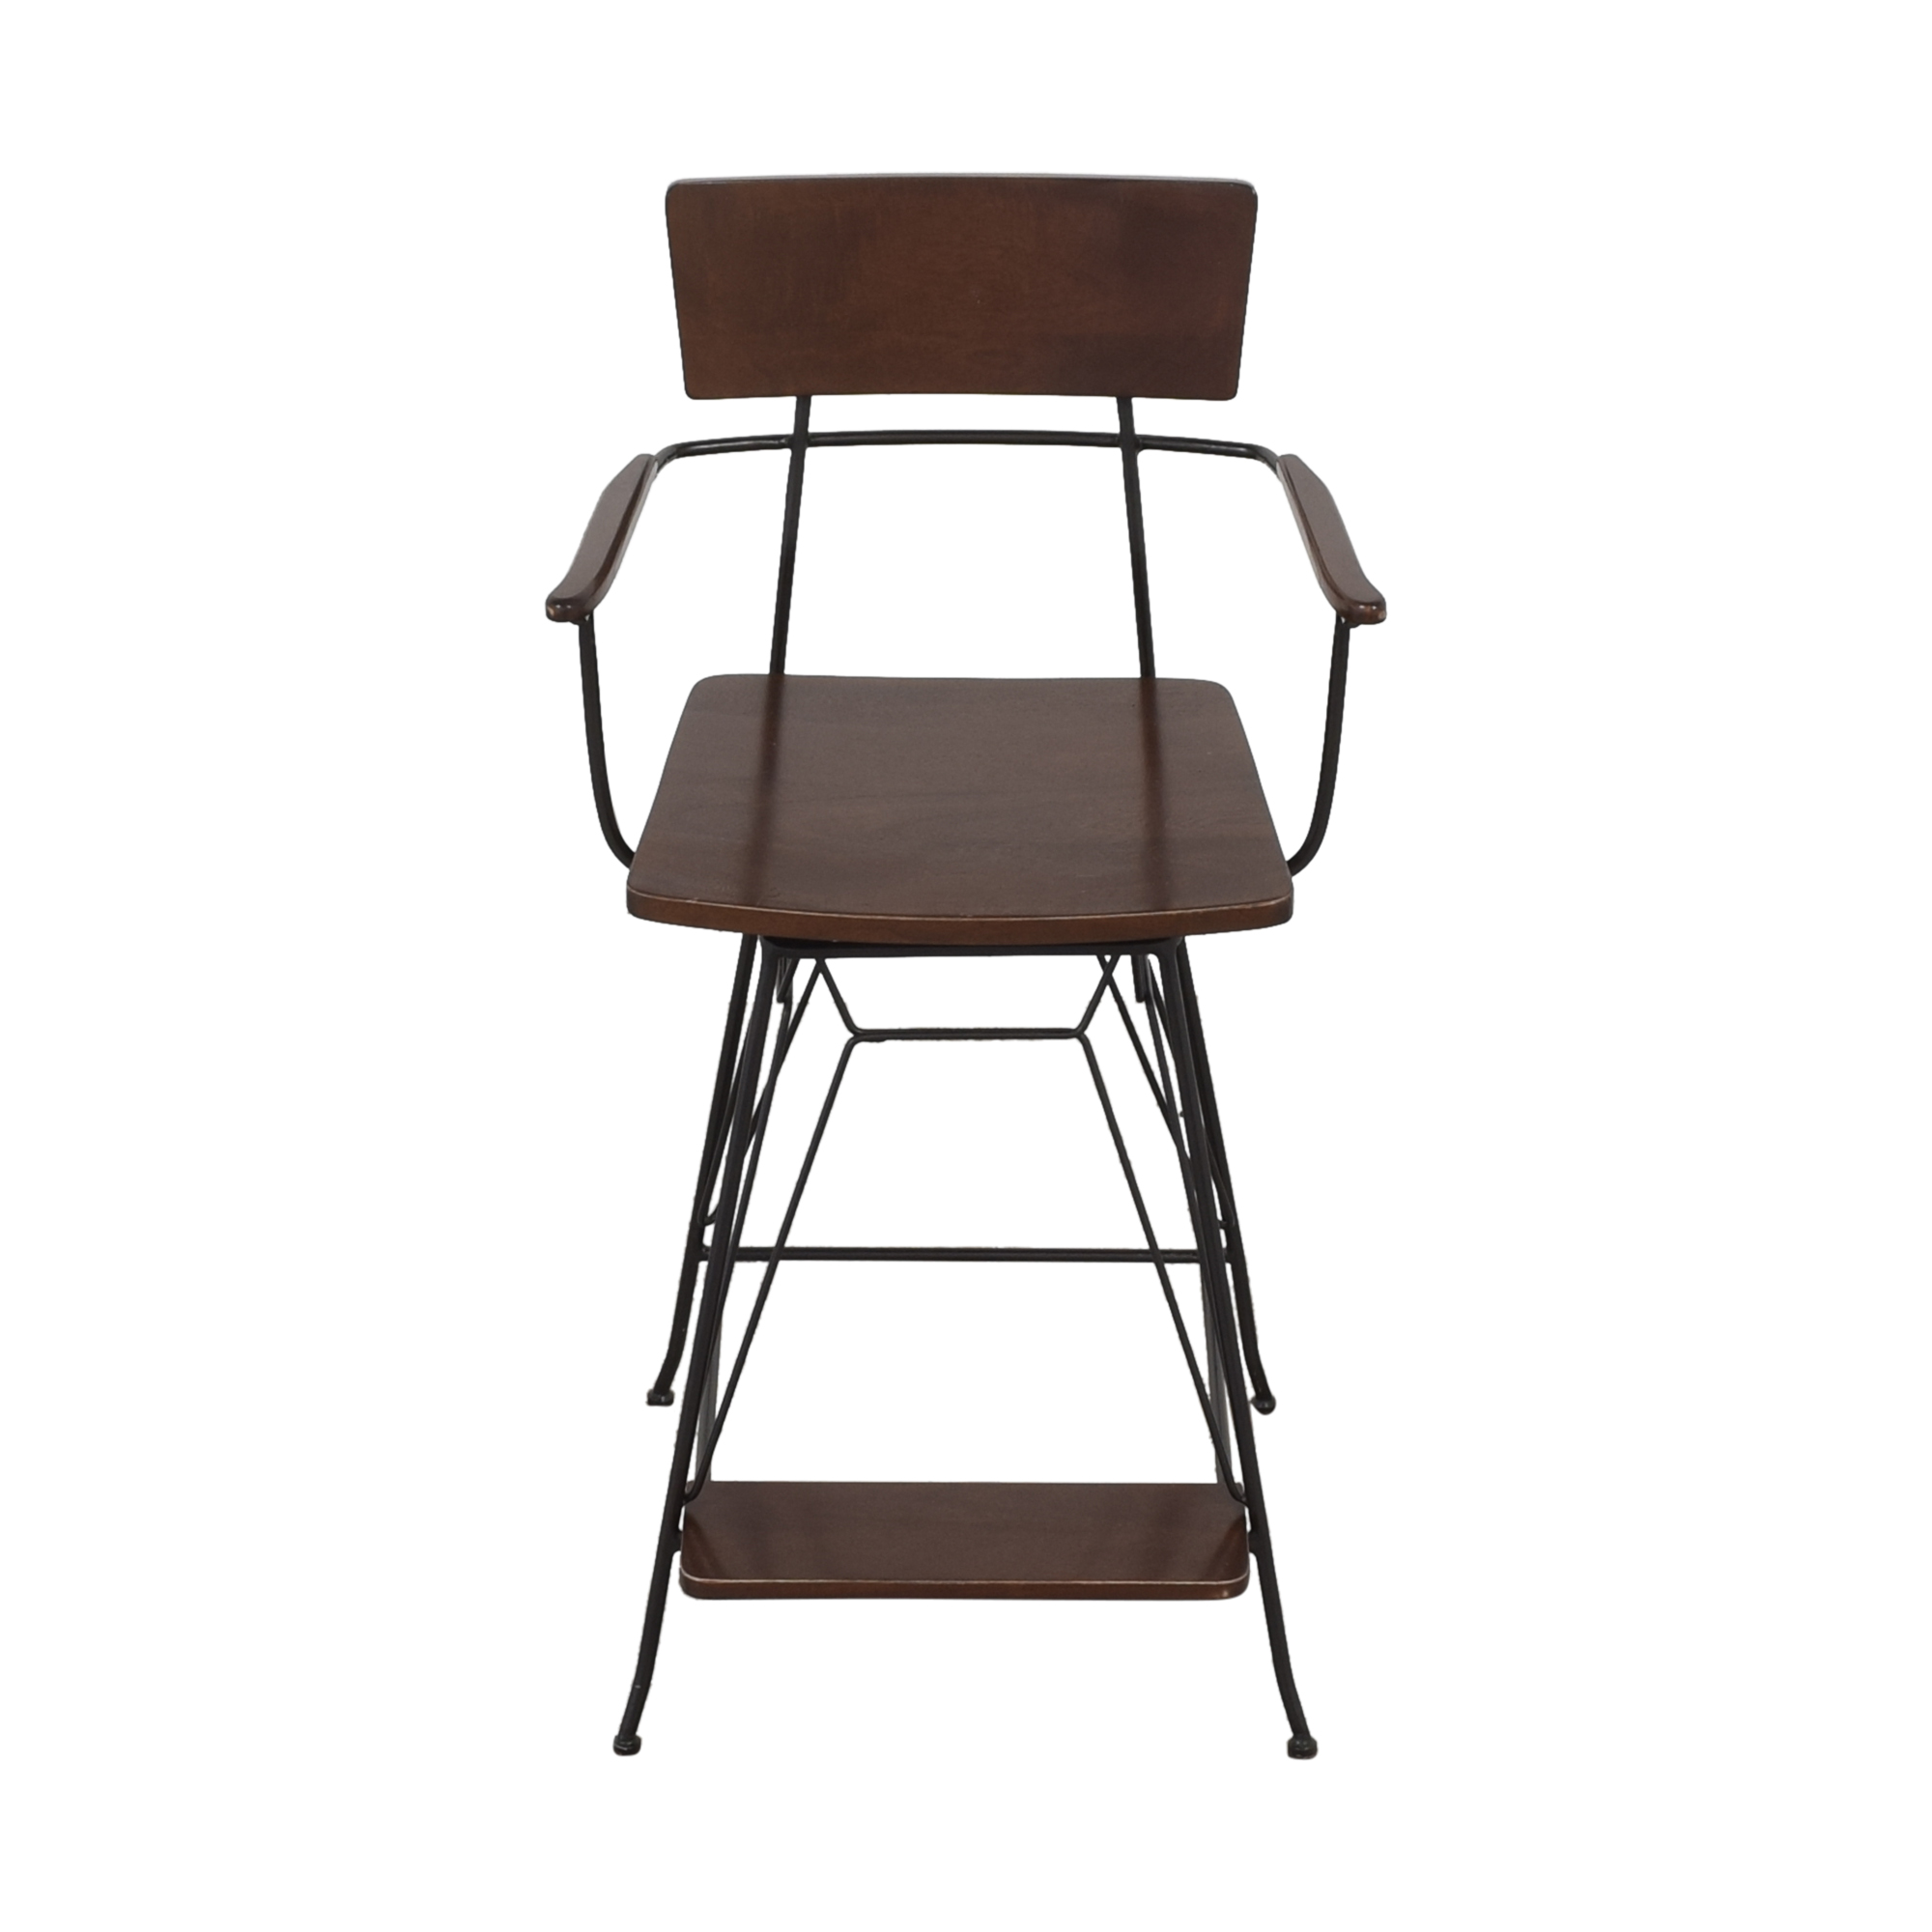 Crate & Barrel Elston Swivel Bar Stool / Chairs